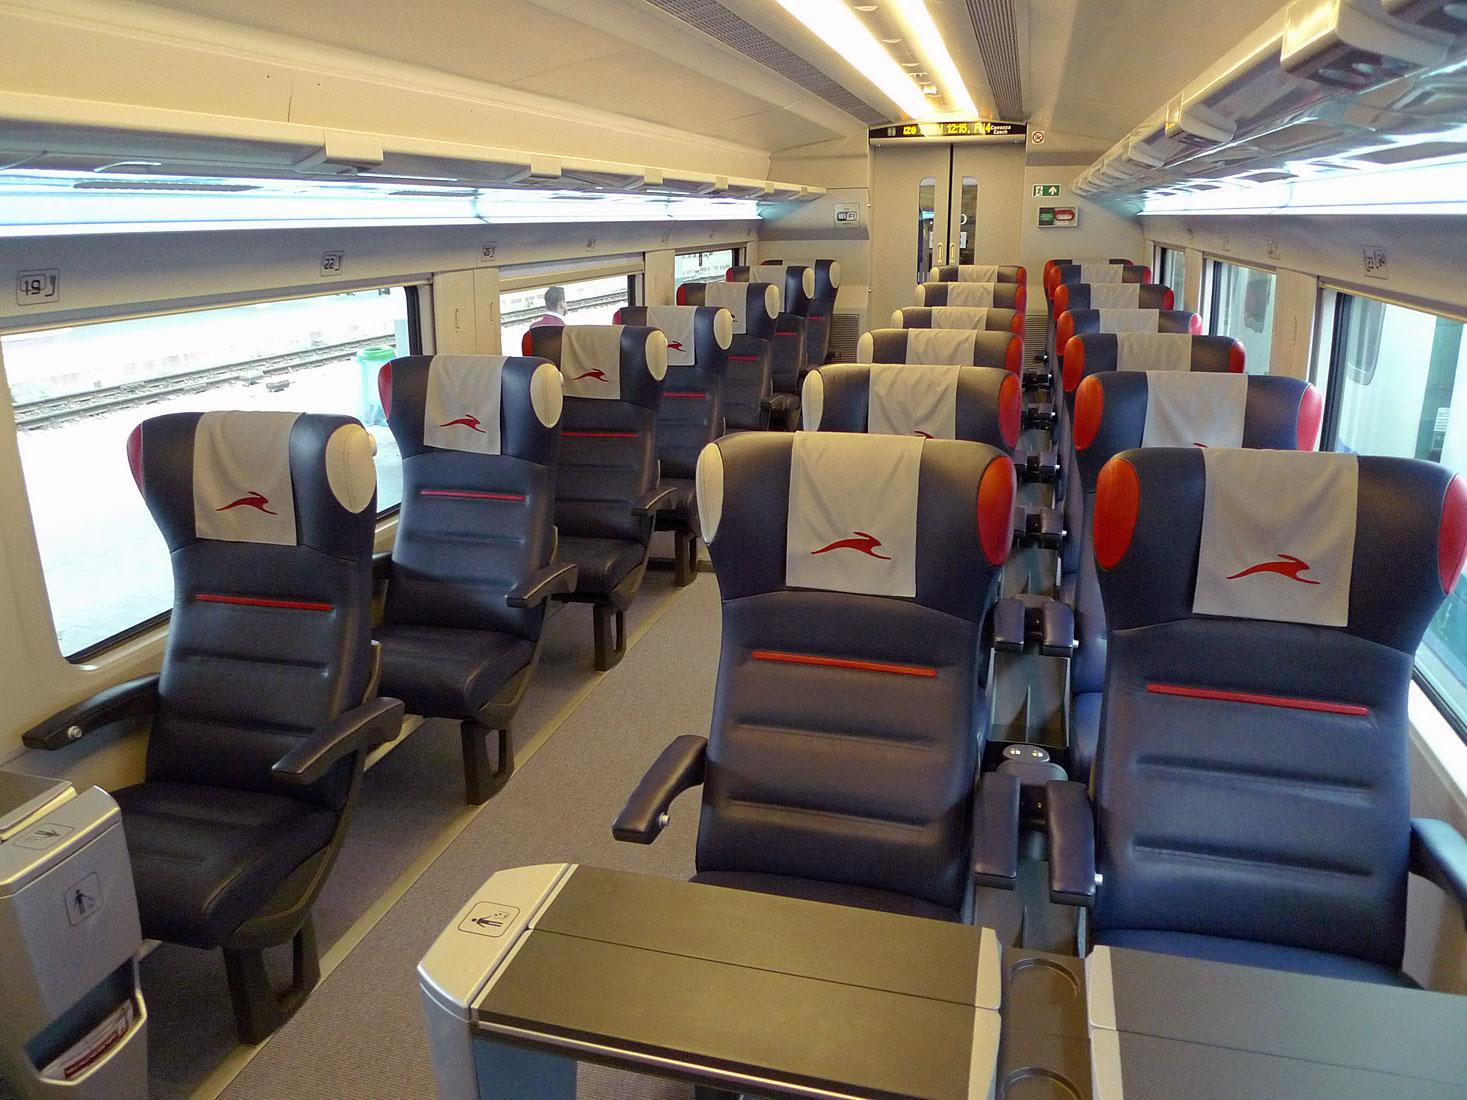 Admirable Italo Trains Italo Tickets From 15 Beatyapartments Chair Design Images Beatyapartmentscom